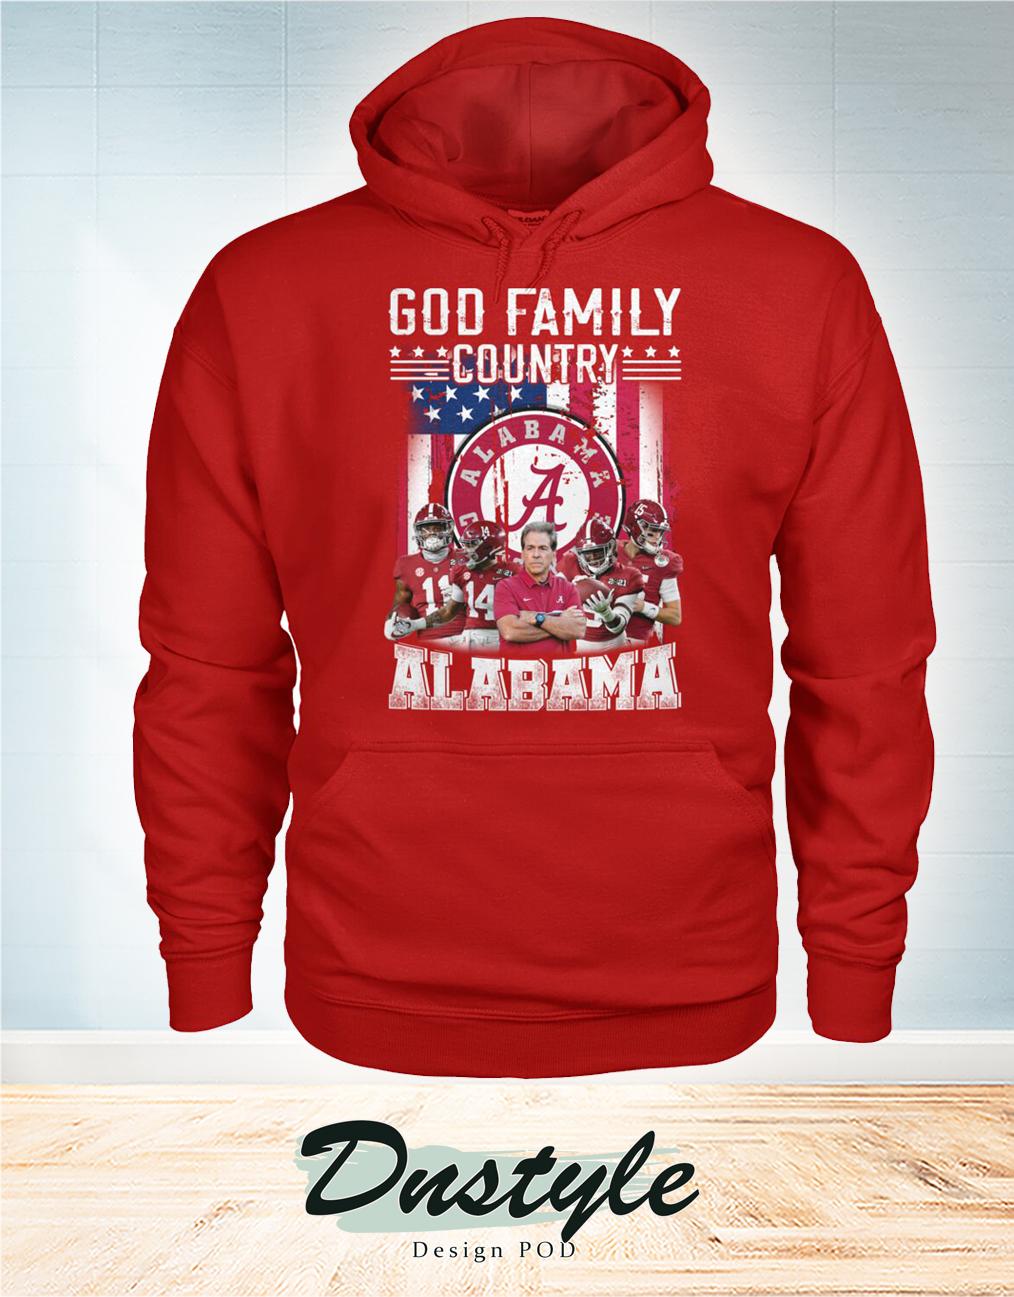 God family country Alabama hoodie